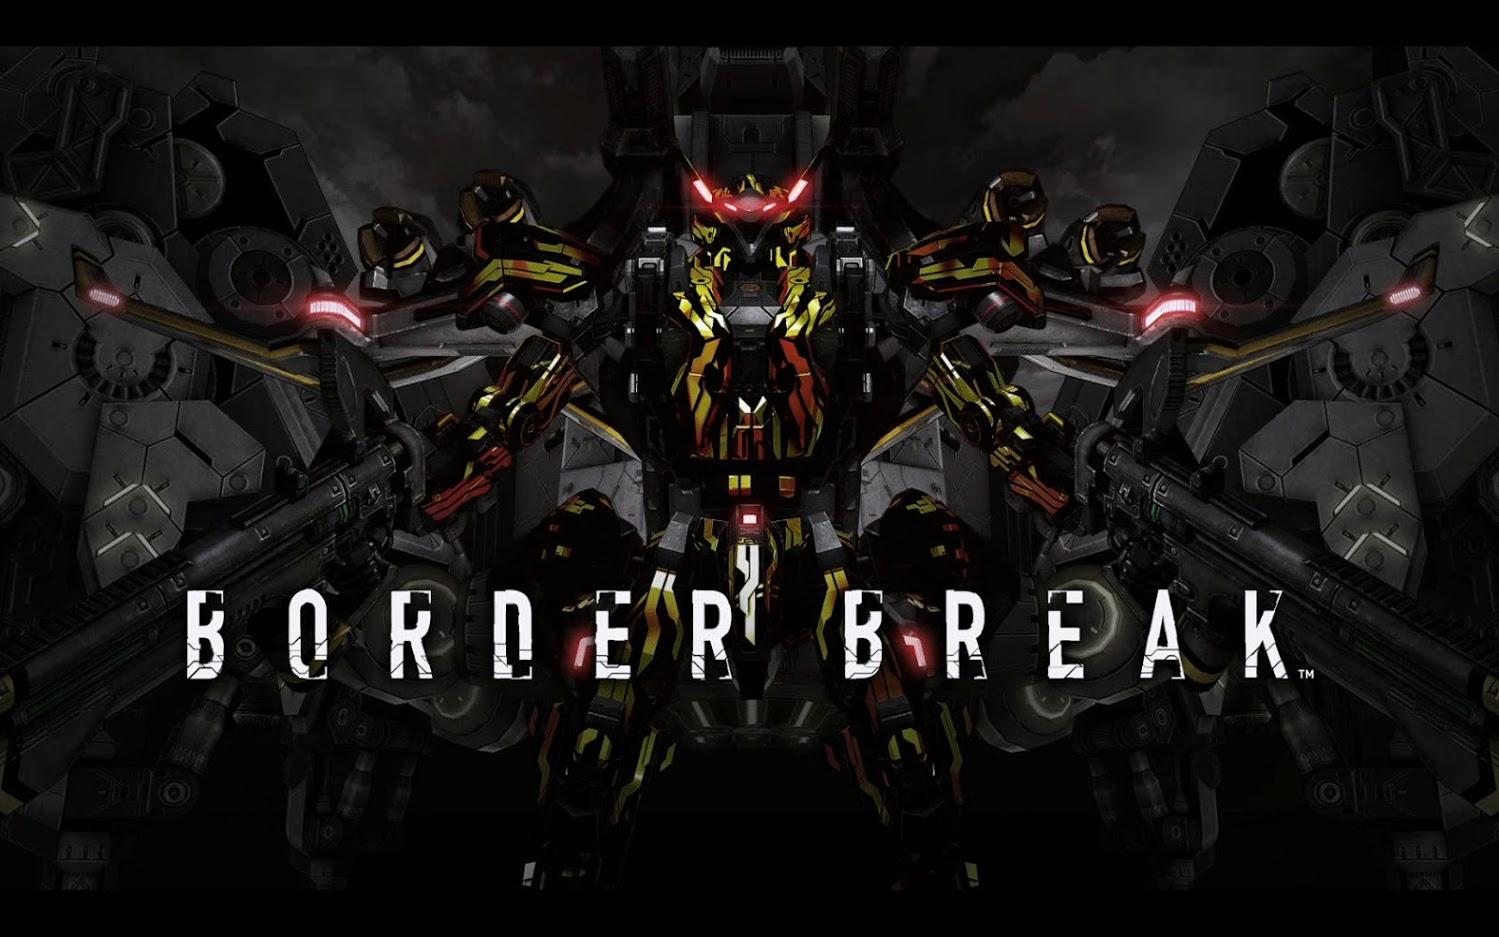 BORDER BREAK、91週目(第一次『パン派』『ごはん派』コンフリクト開催告知)